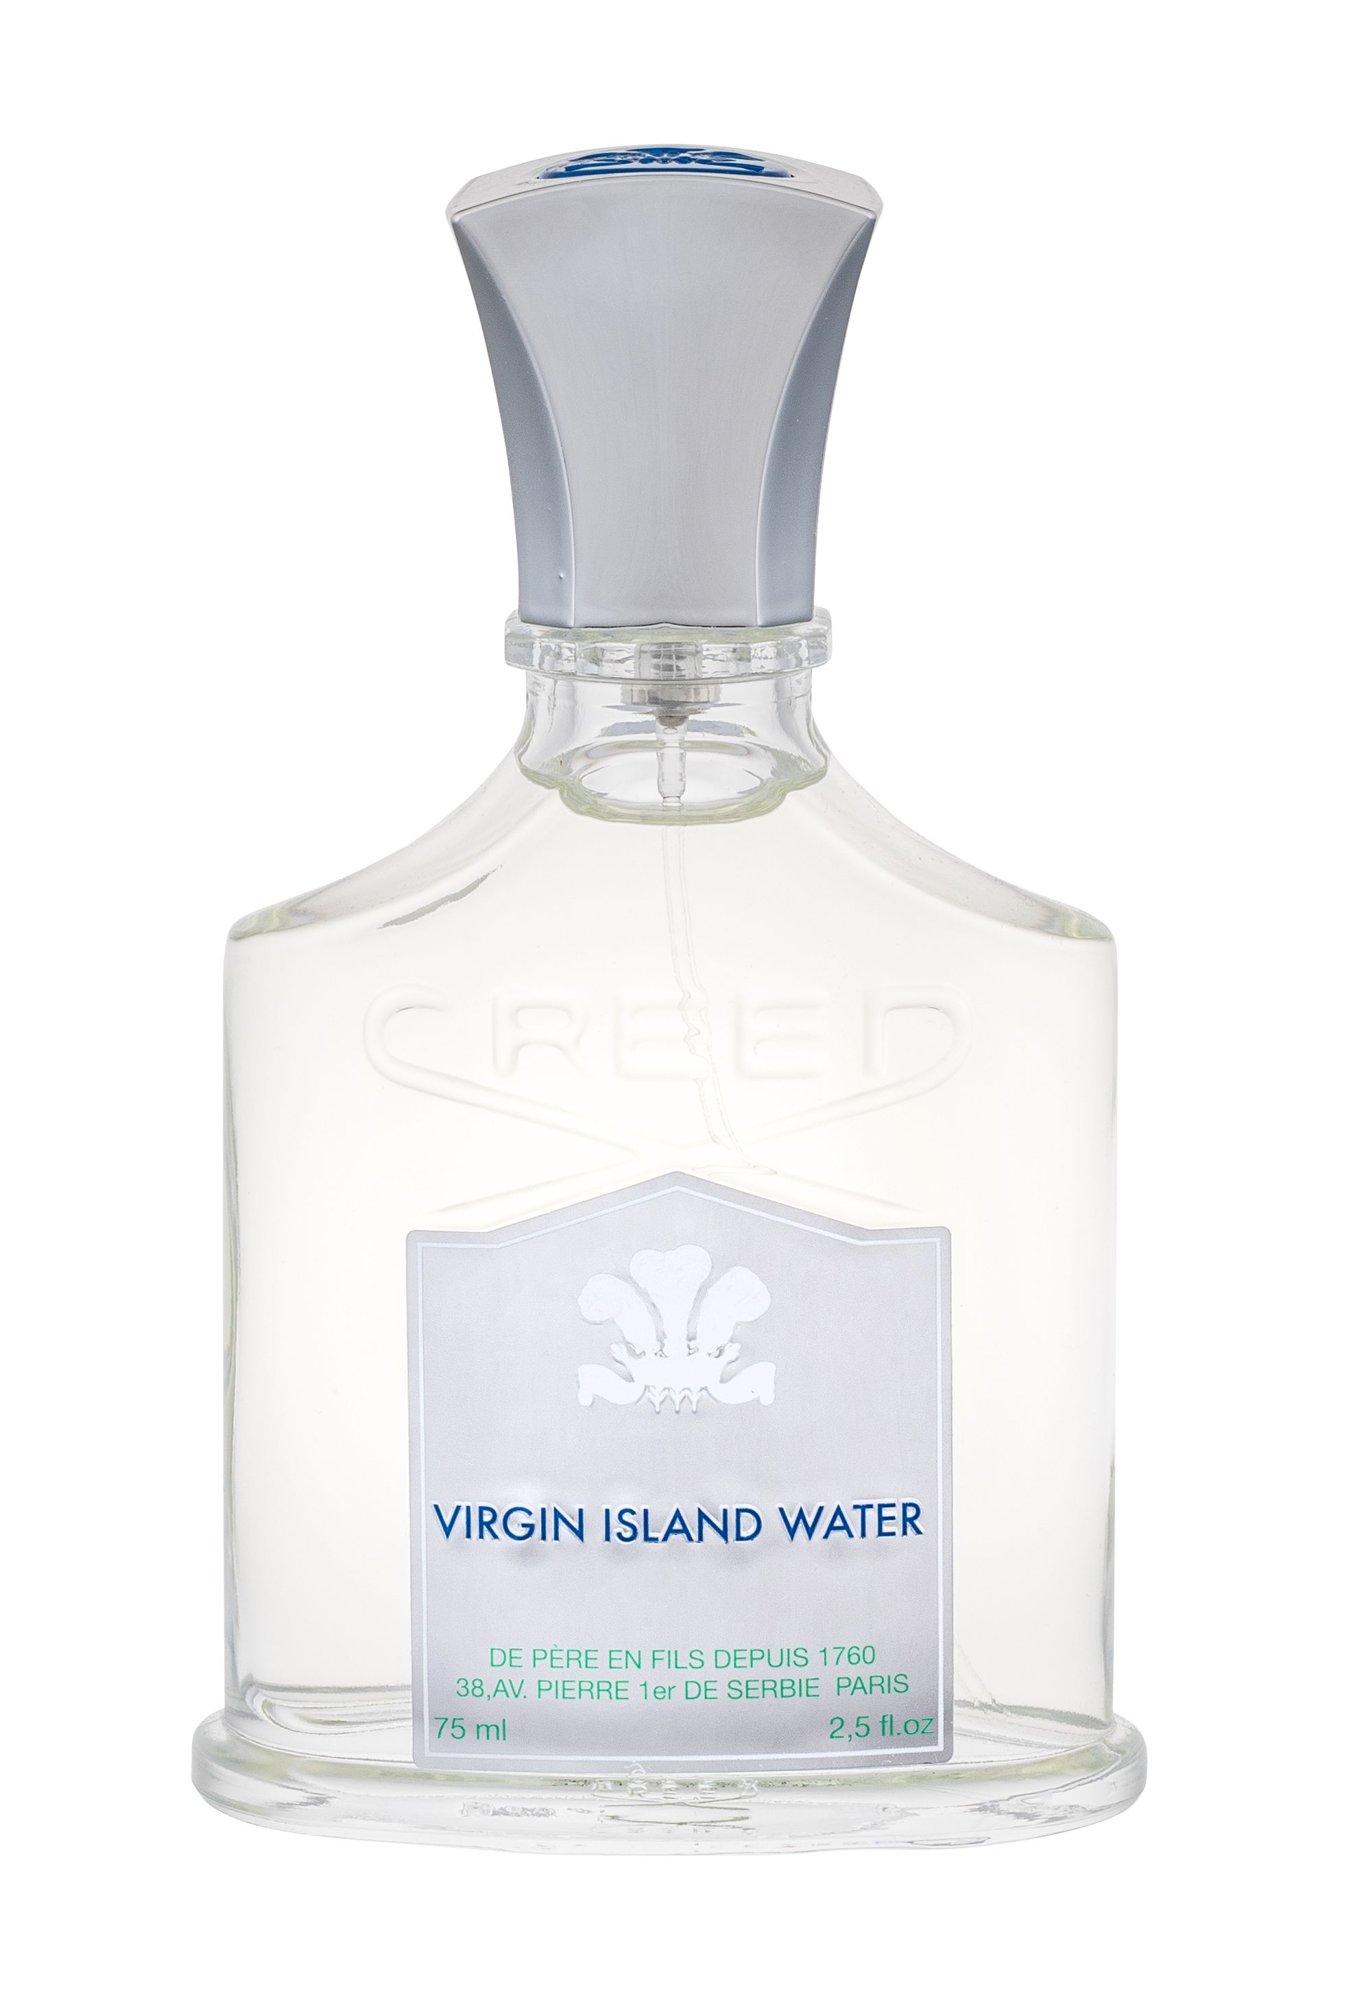 Creed Virgin Island Water Eau de Parfum 75ml